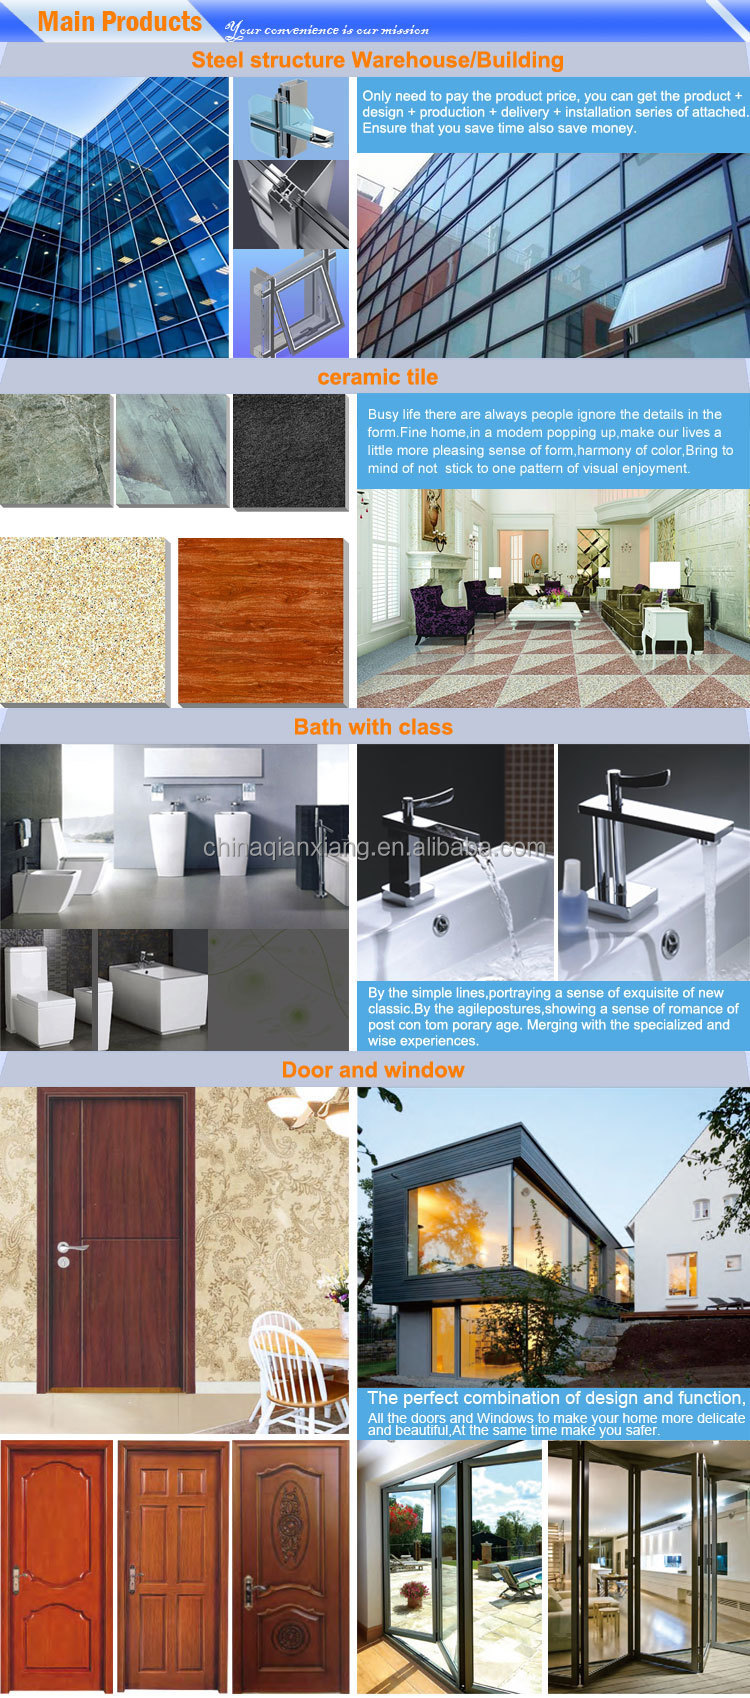 Bathroom tiles wash basin wall tiles price front wall tile in bathroom tiles wash basin wall tiles price front wall tile in india dailygadgetfo Image collections